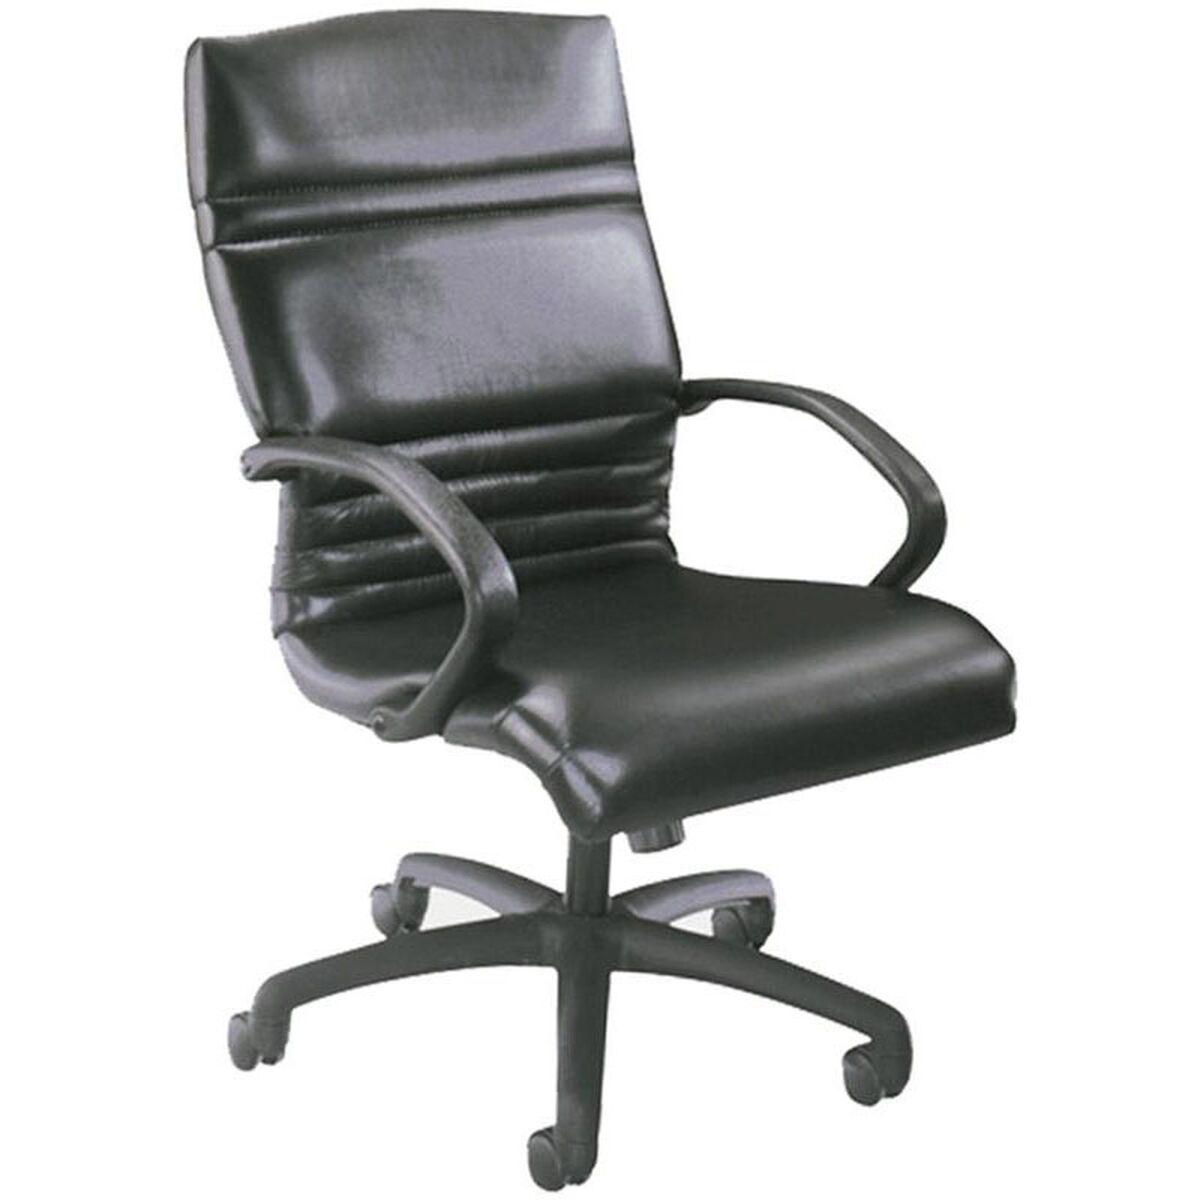 High Point Furniture Industries 1221 Hpf 1221